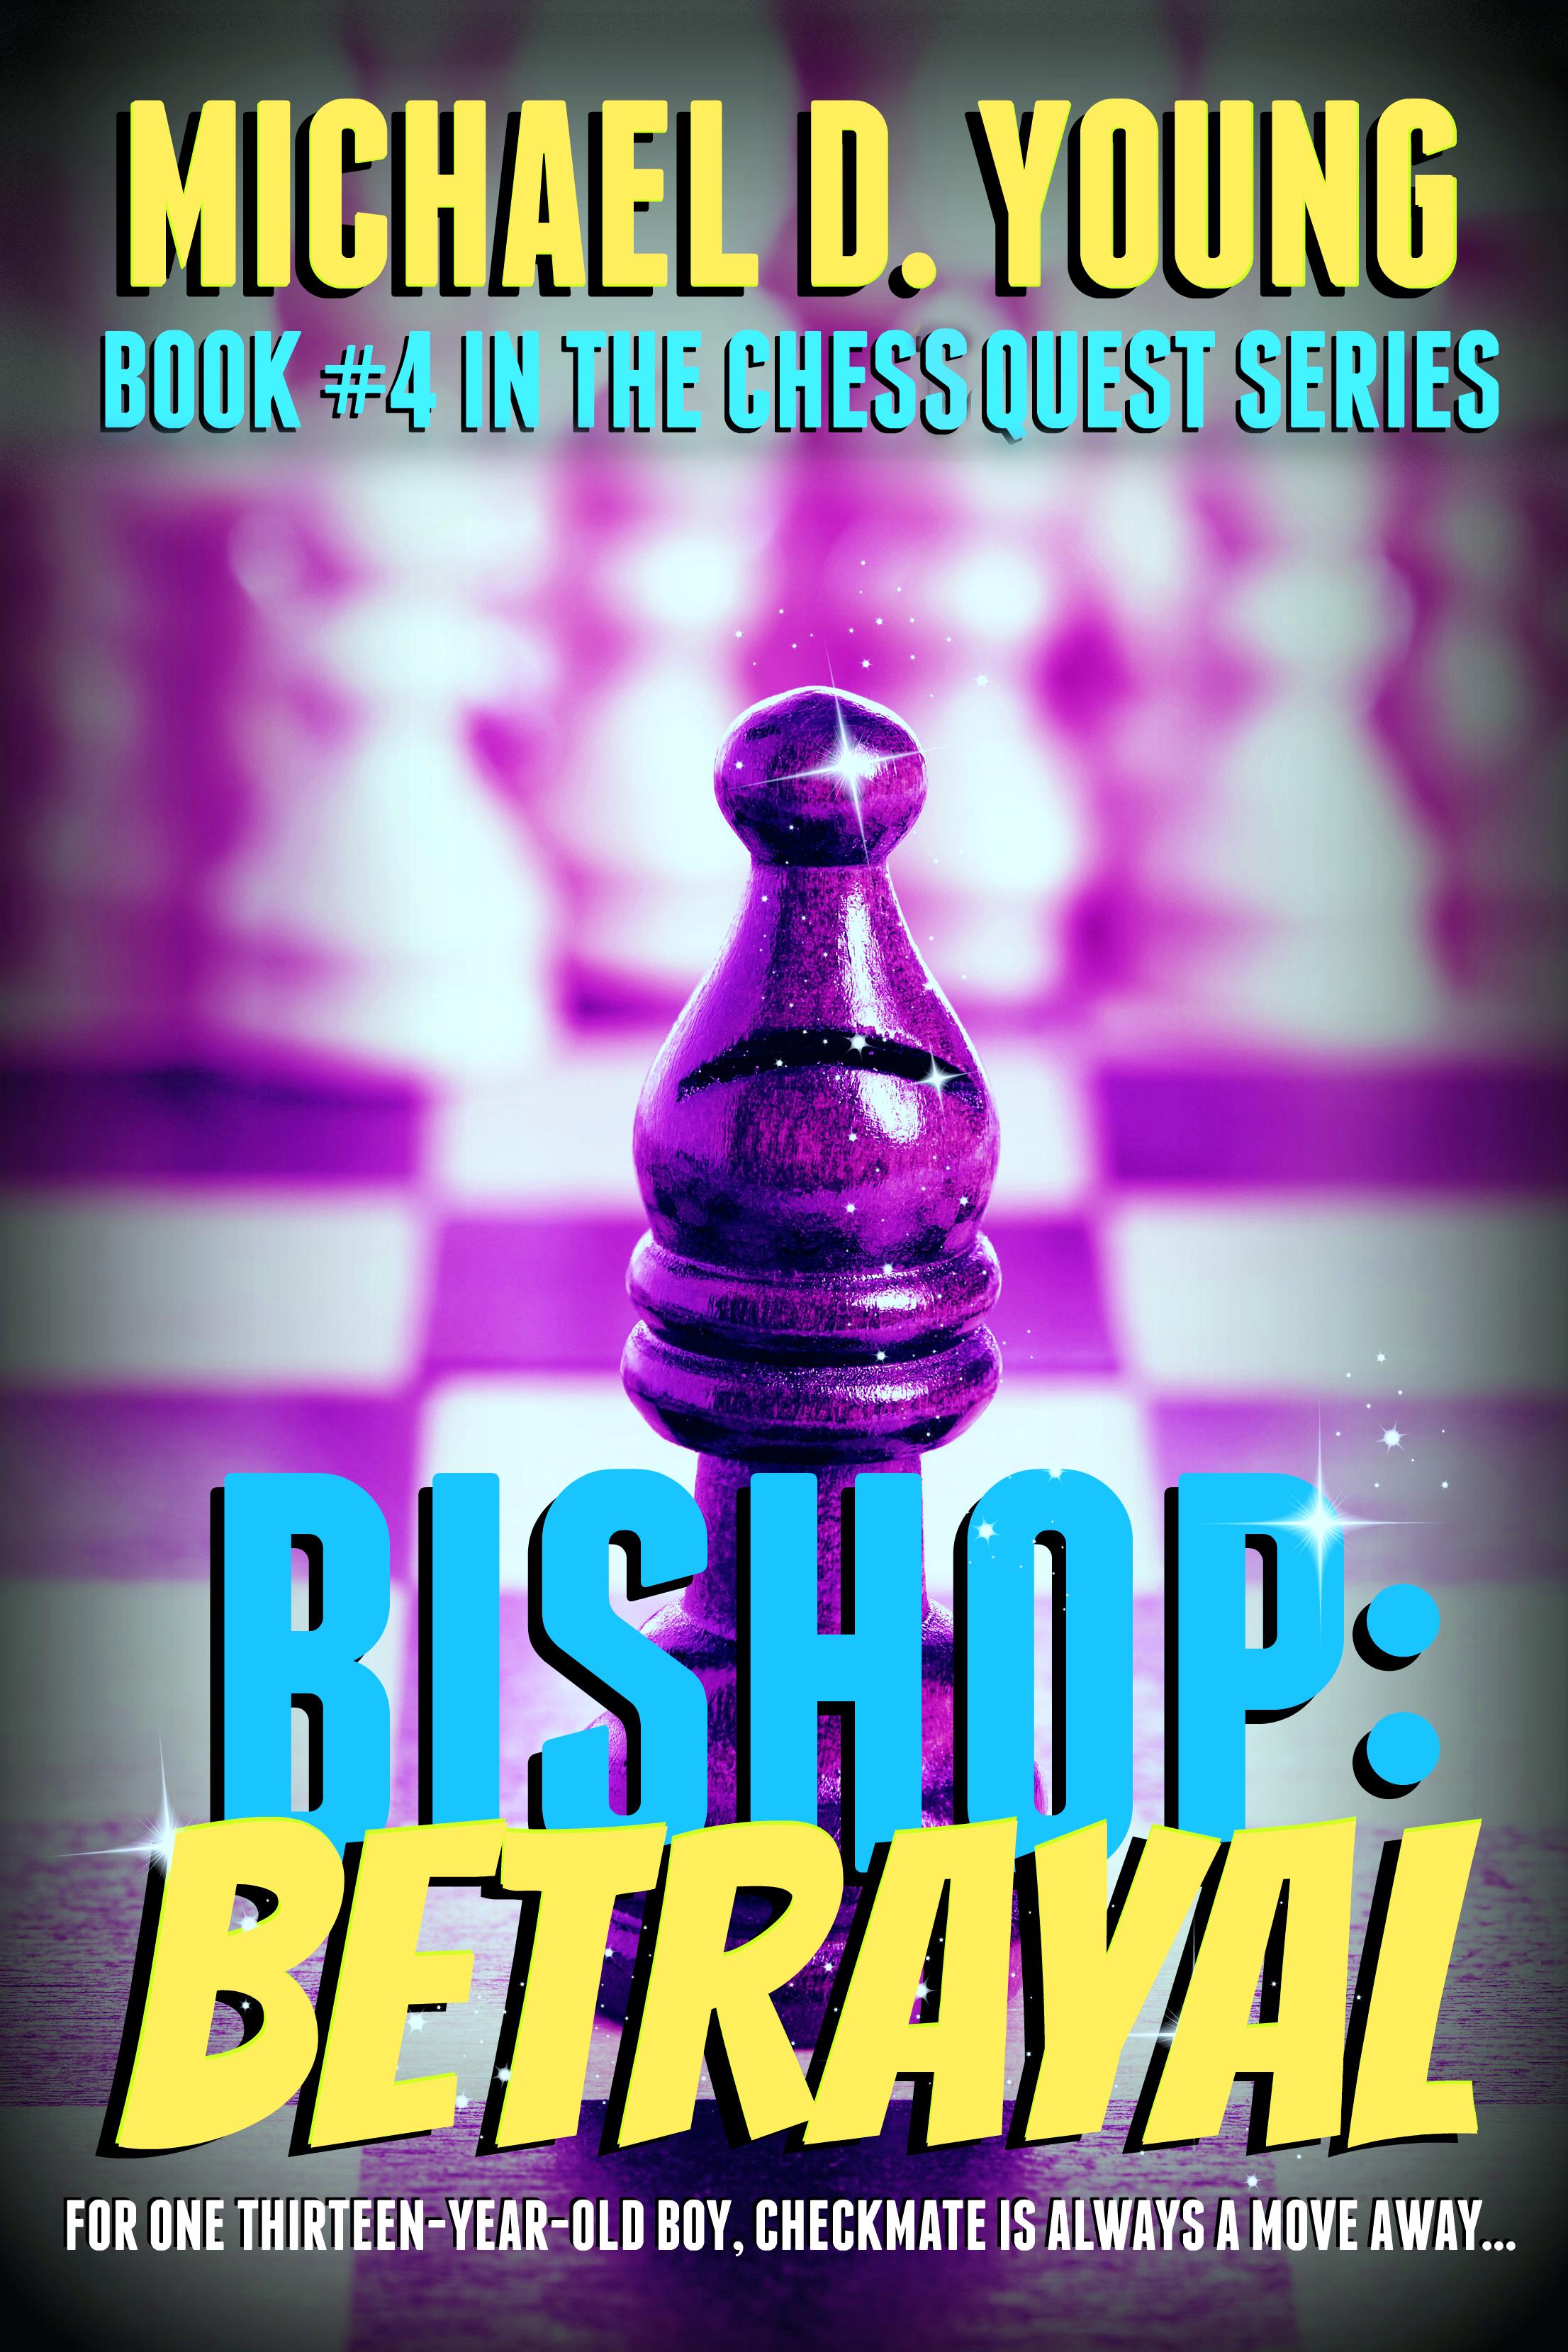 Bishop1bb